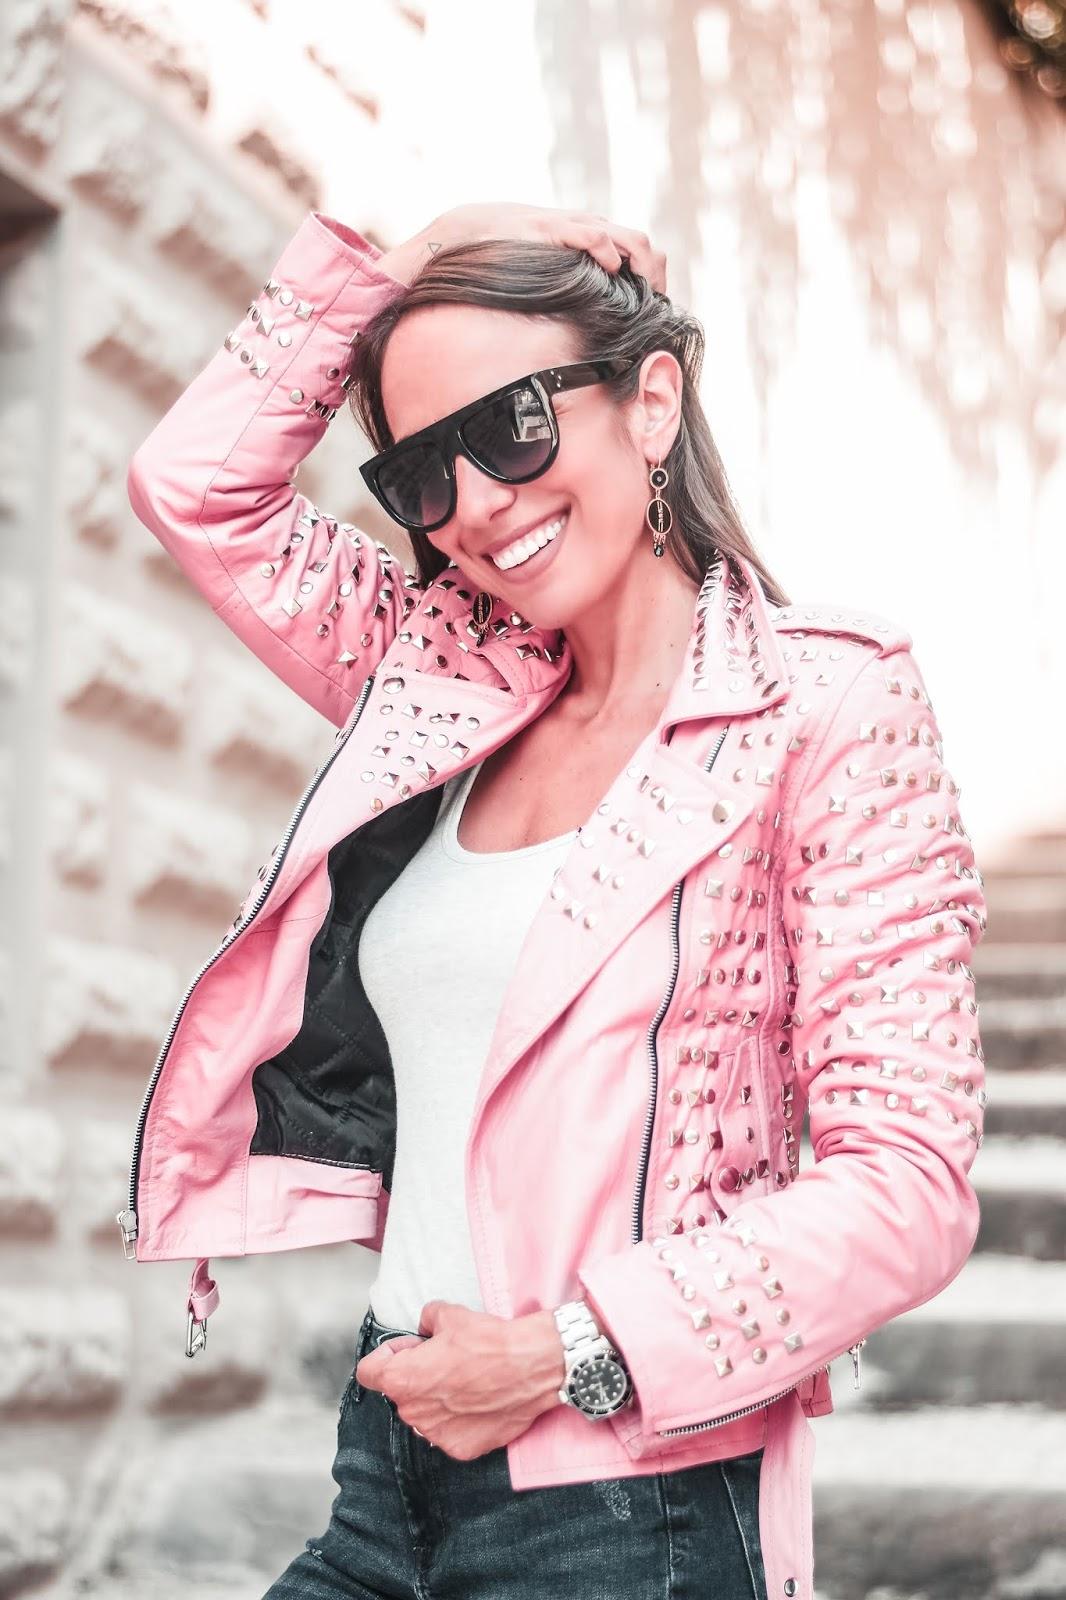 giacca pelle rosa borchiata